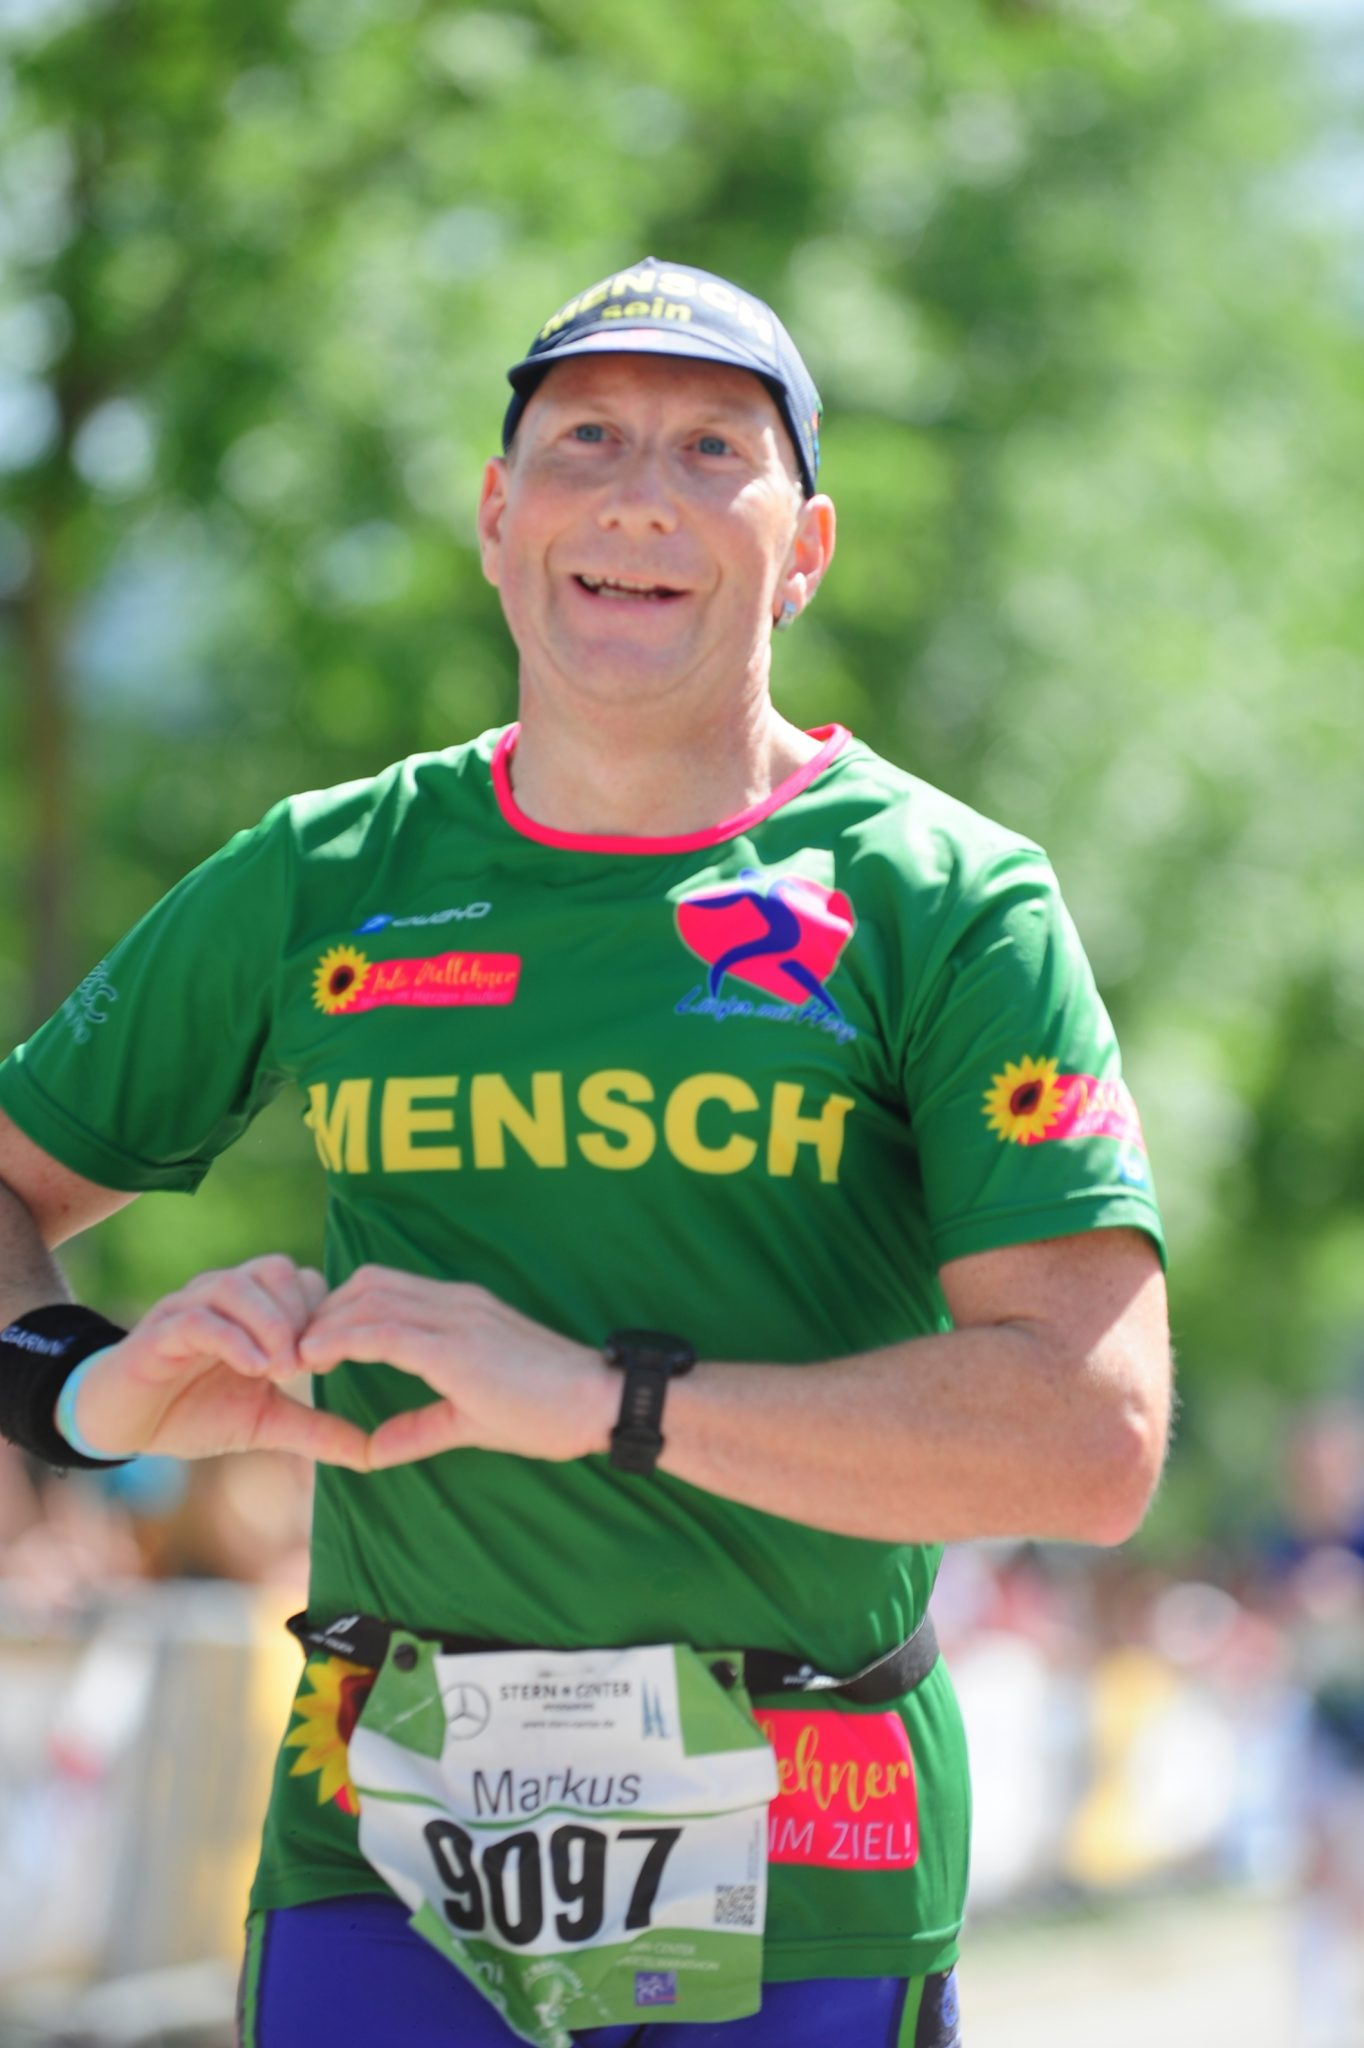 Markus Rajzer - Regensburg Marathon 2019